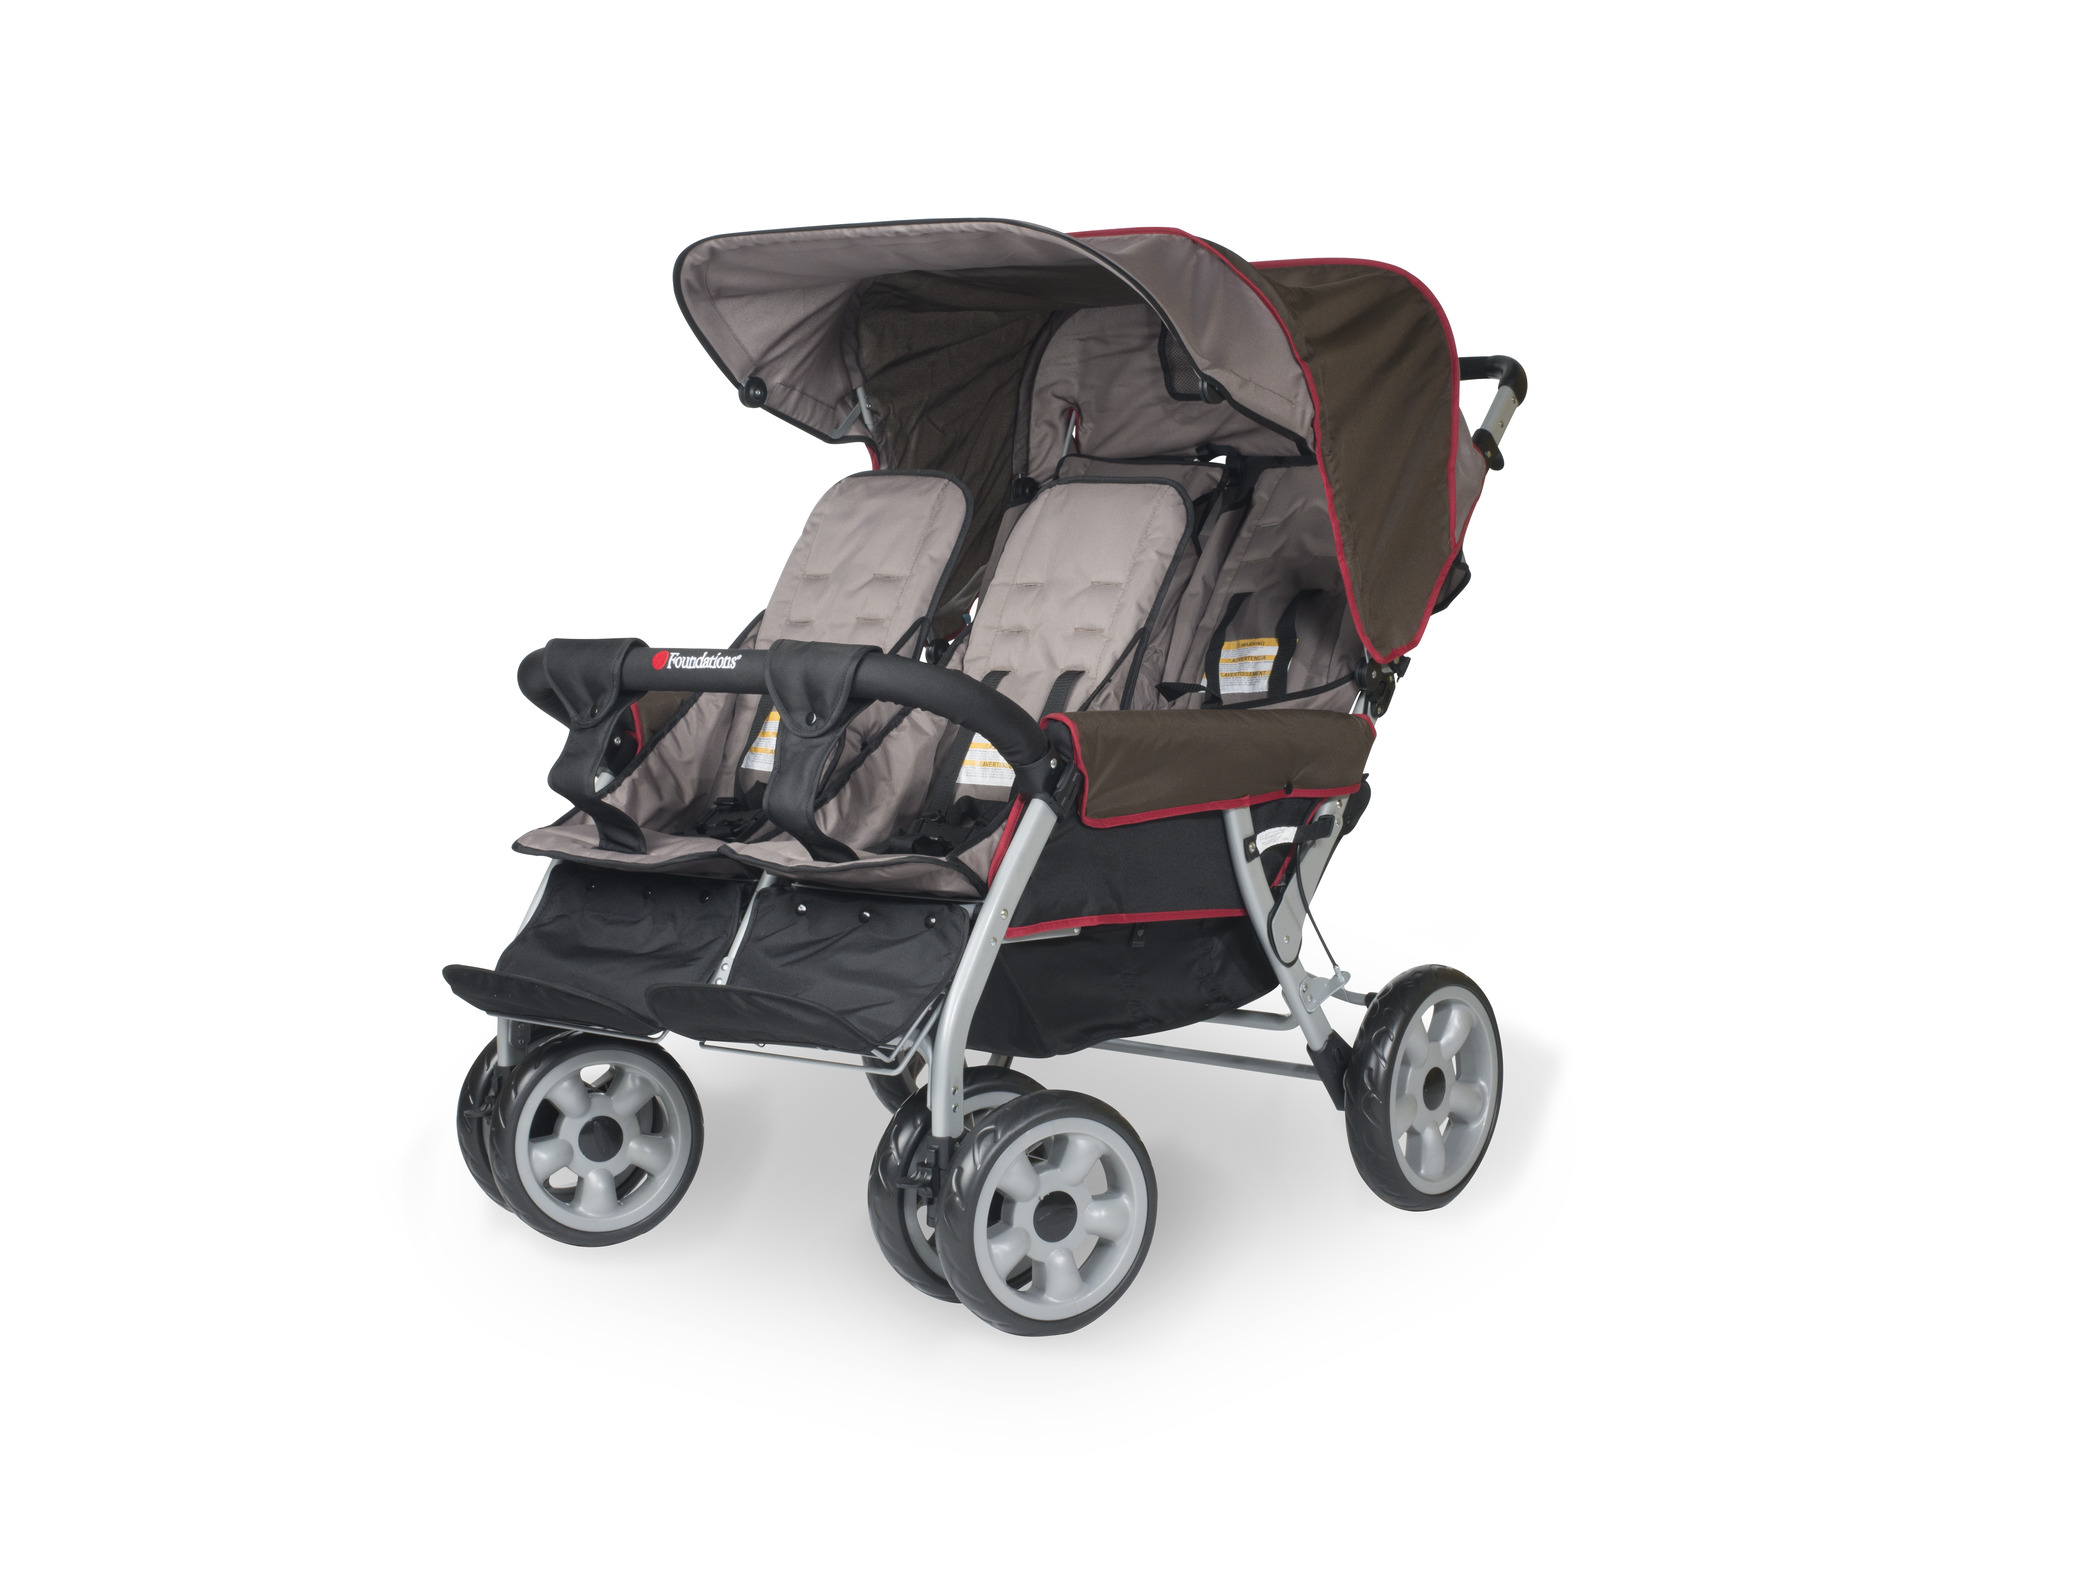 kita krippenwagen kinderwagen 4 sitzer lx4 linea braun. Black Bedroom Furniture Sets. Home Design Ideas